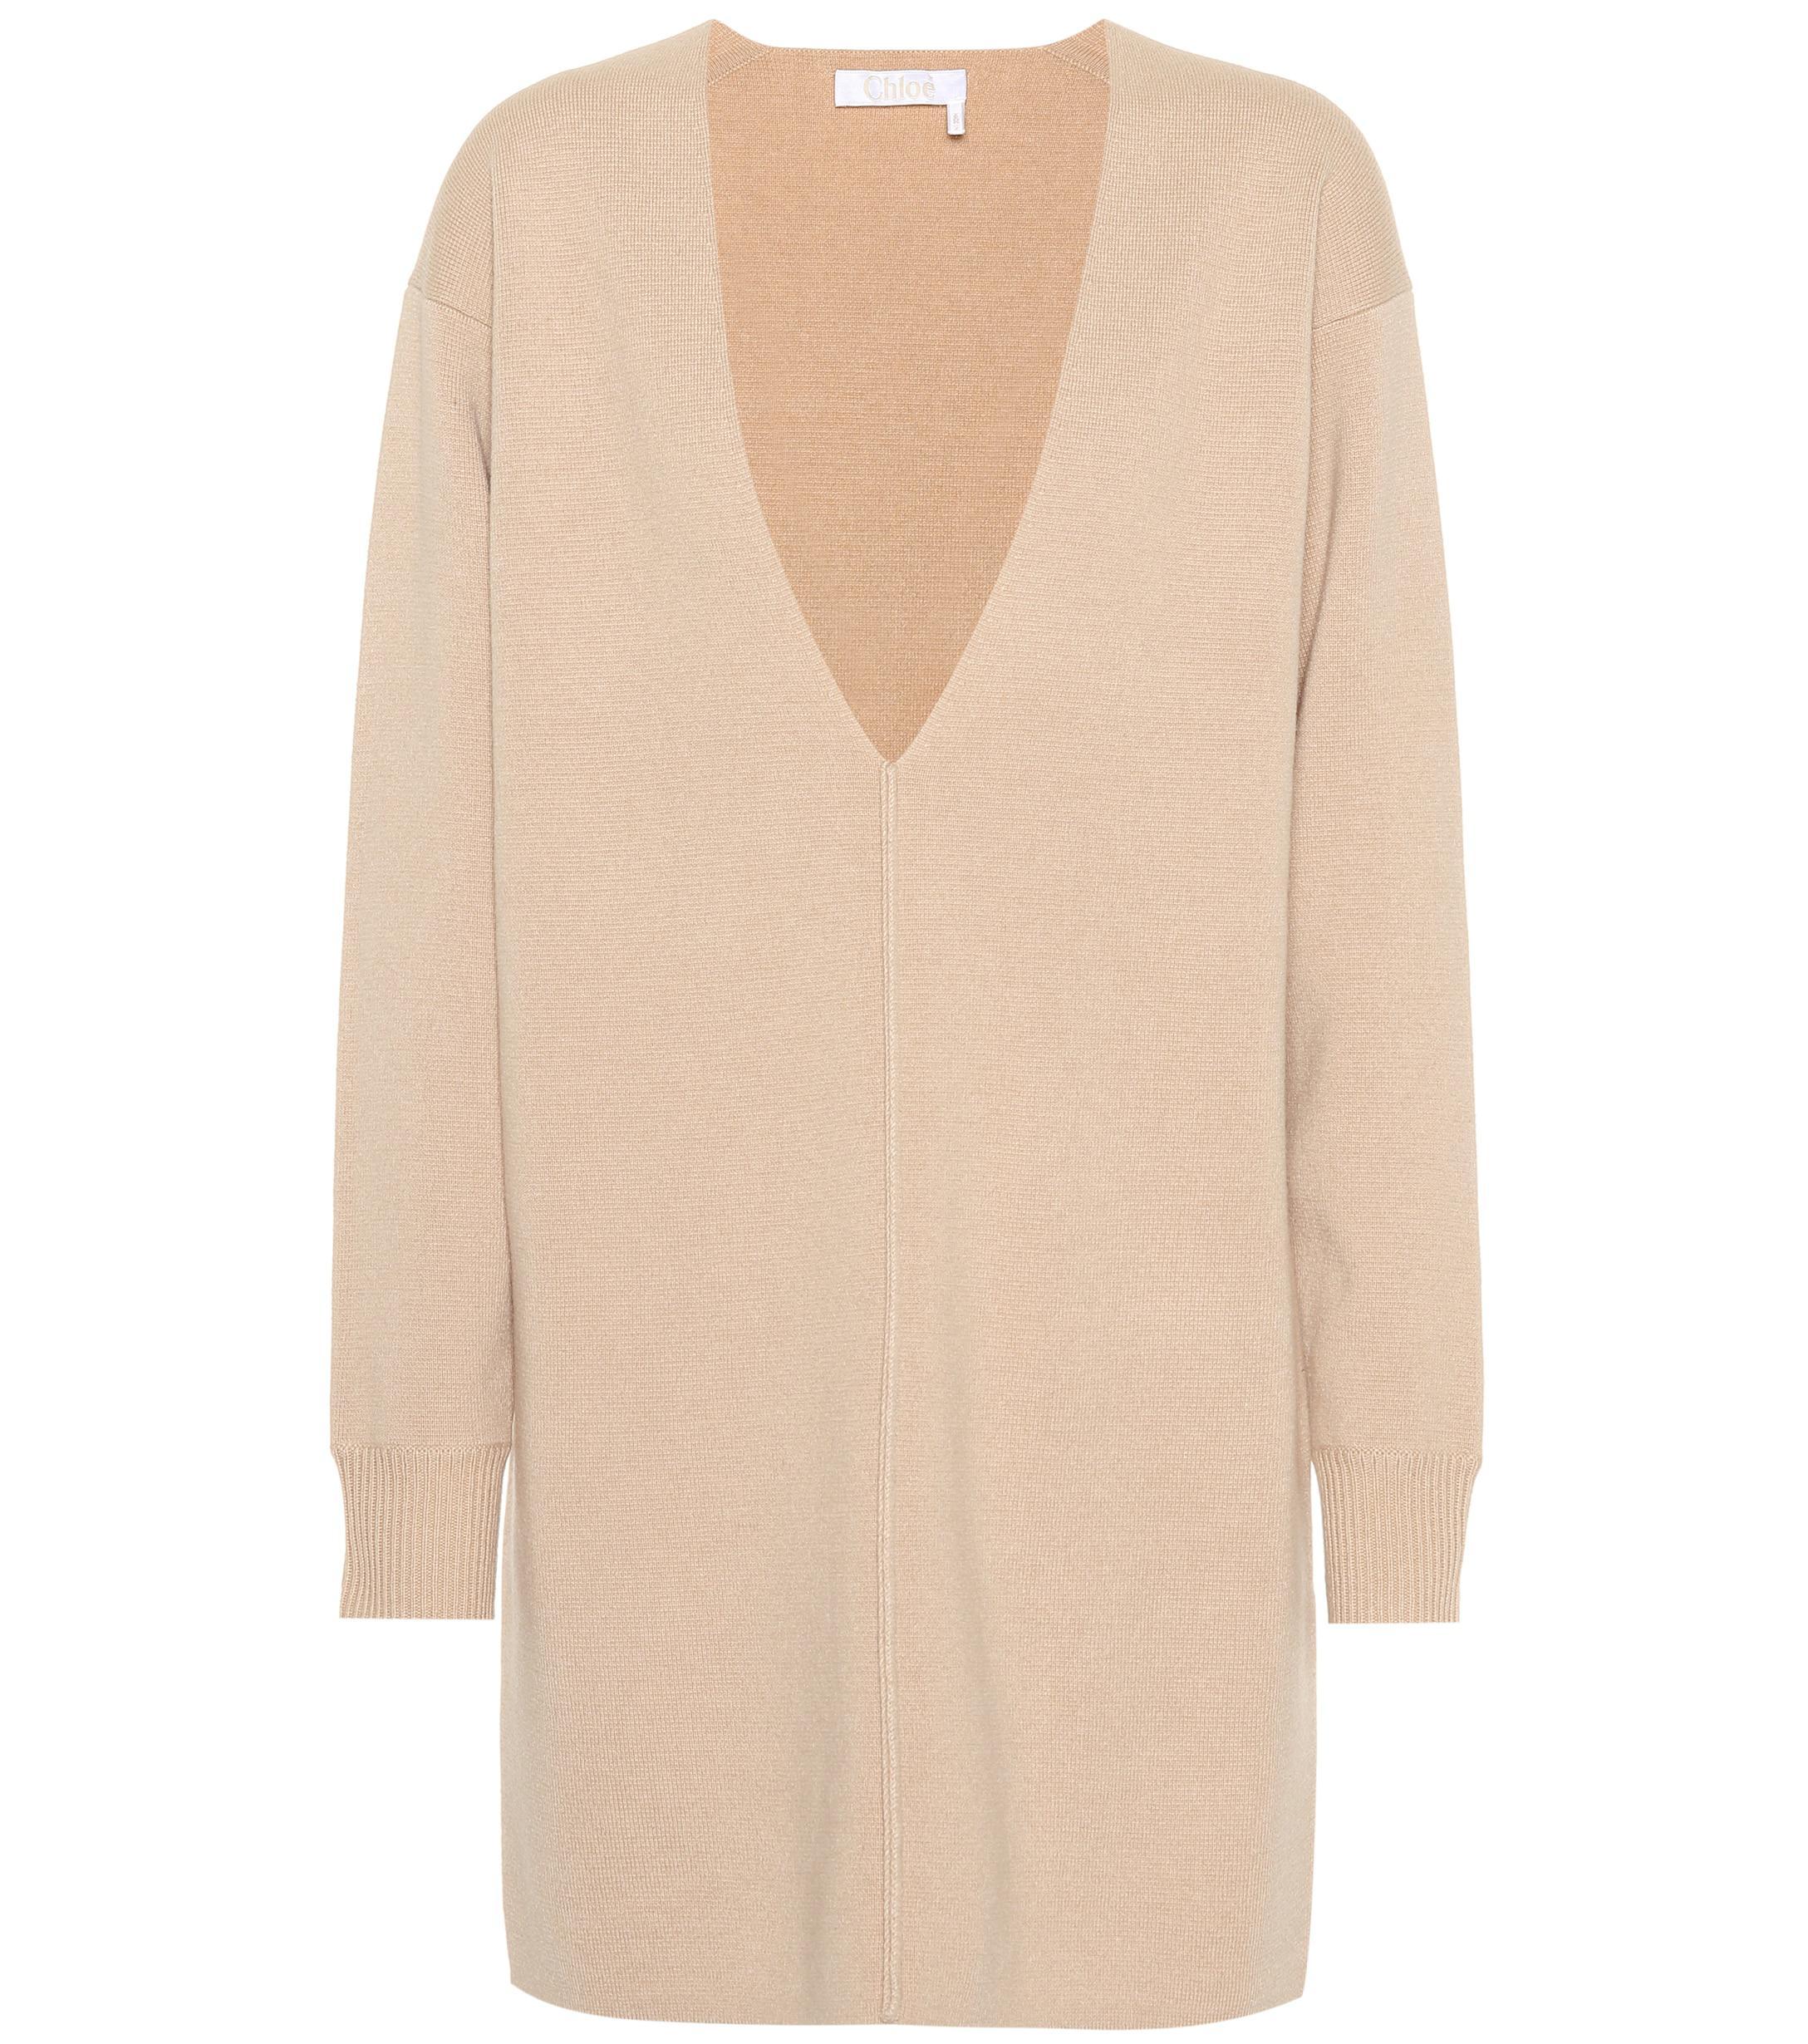 0bcf95bfe29 Chloé. Women s Long Cashmere Sweater